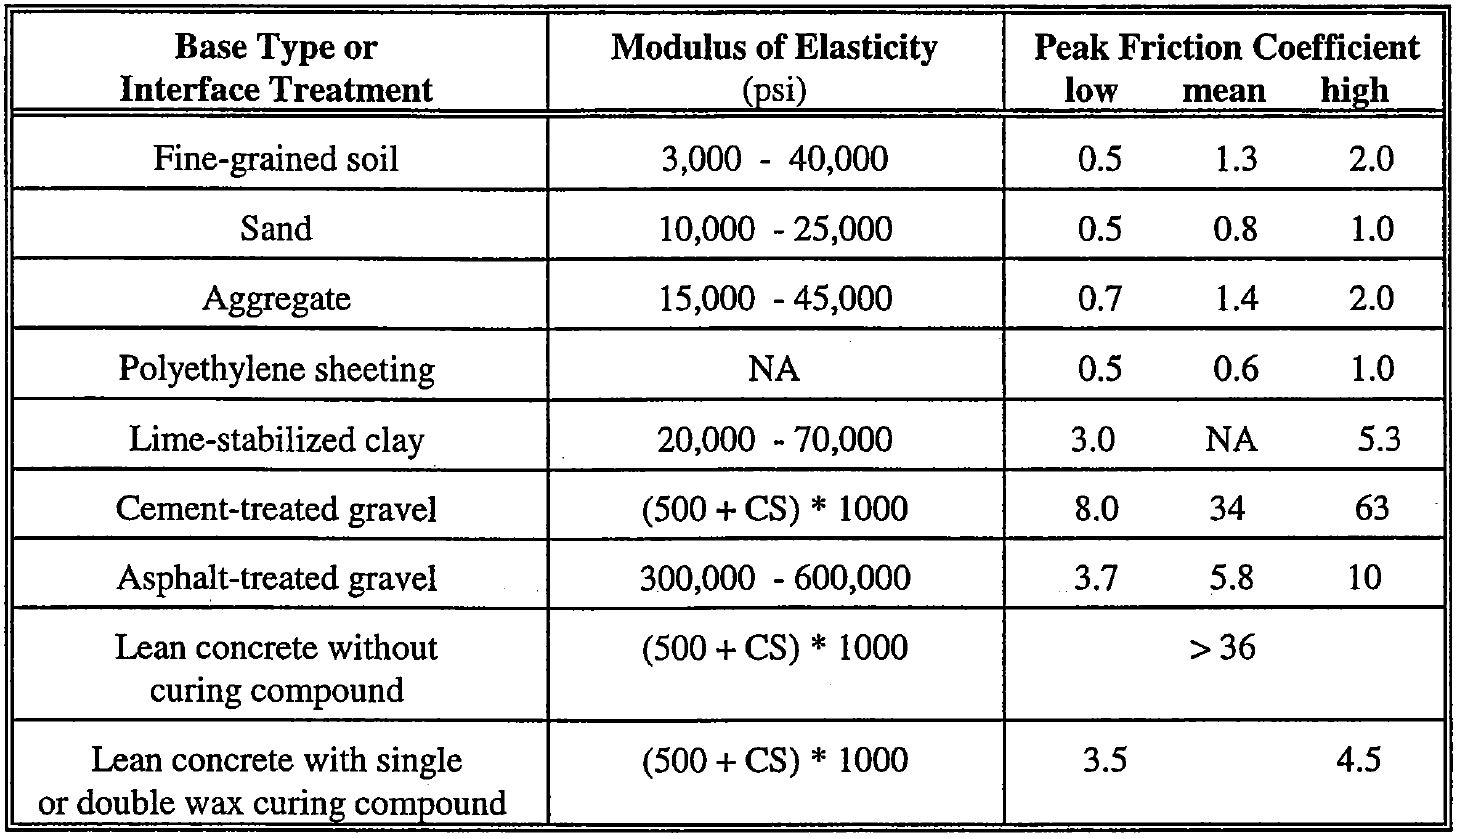 AASHTO Rigid Pavement Design Spreadsheet - Friction Coefficient Table